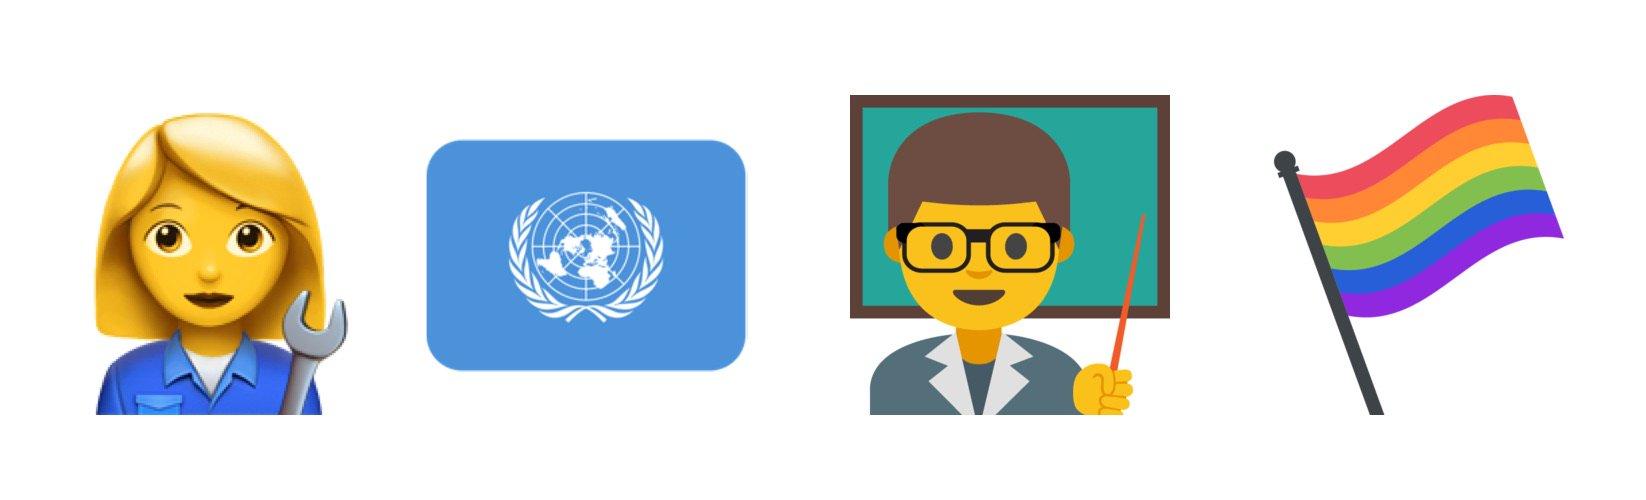 emoji-4-emojis-emojipedia